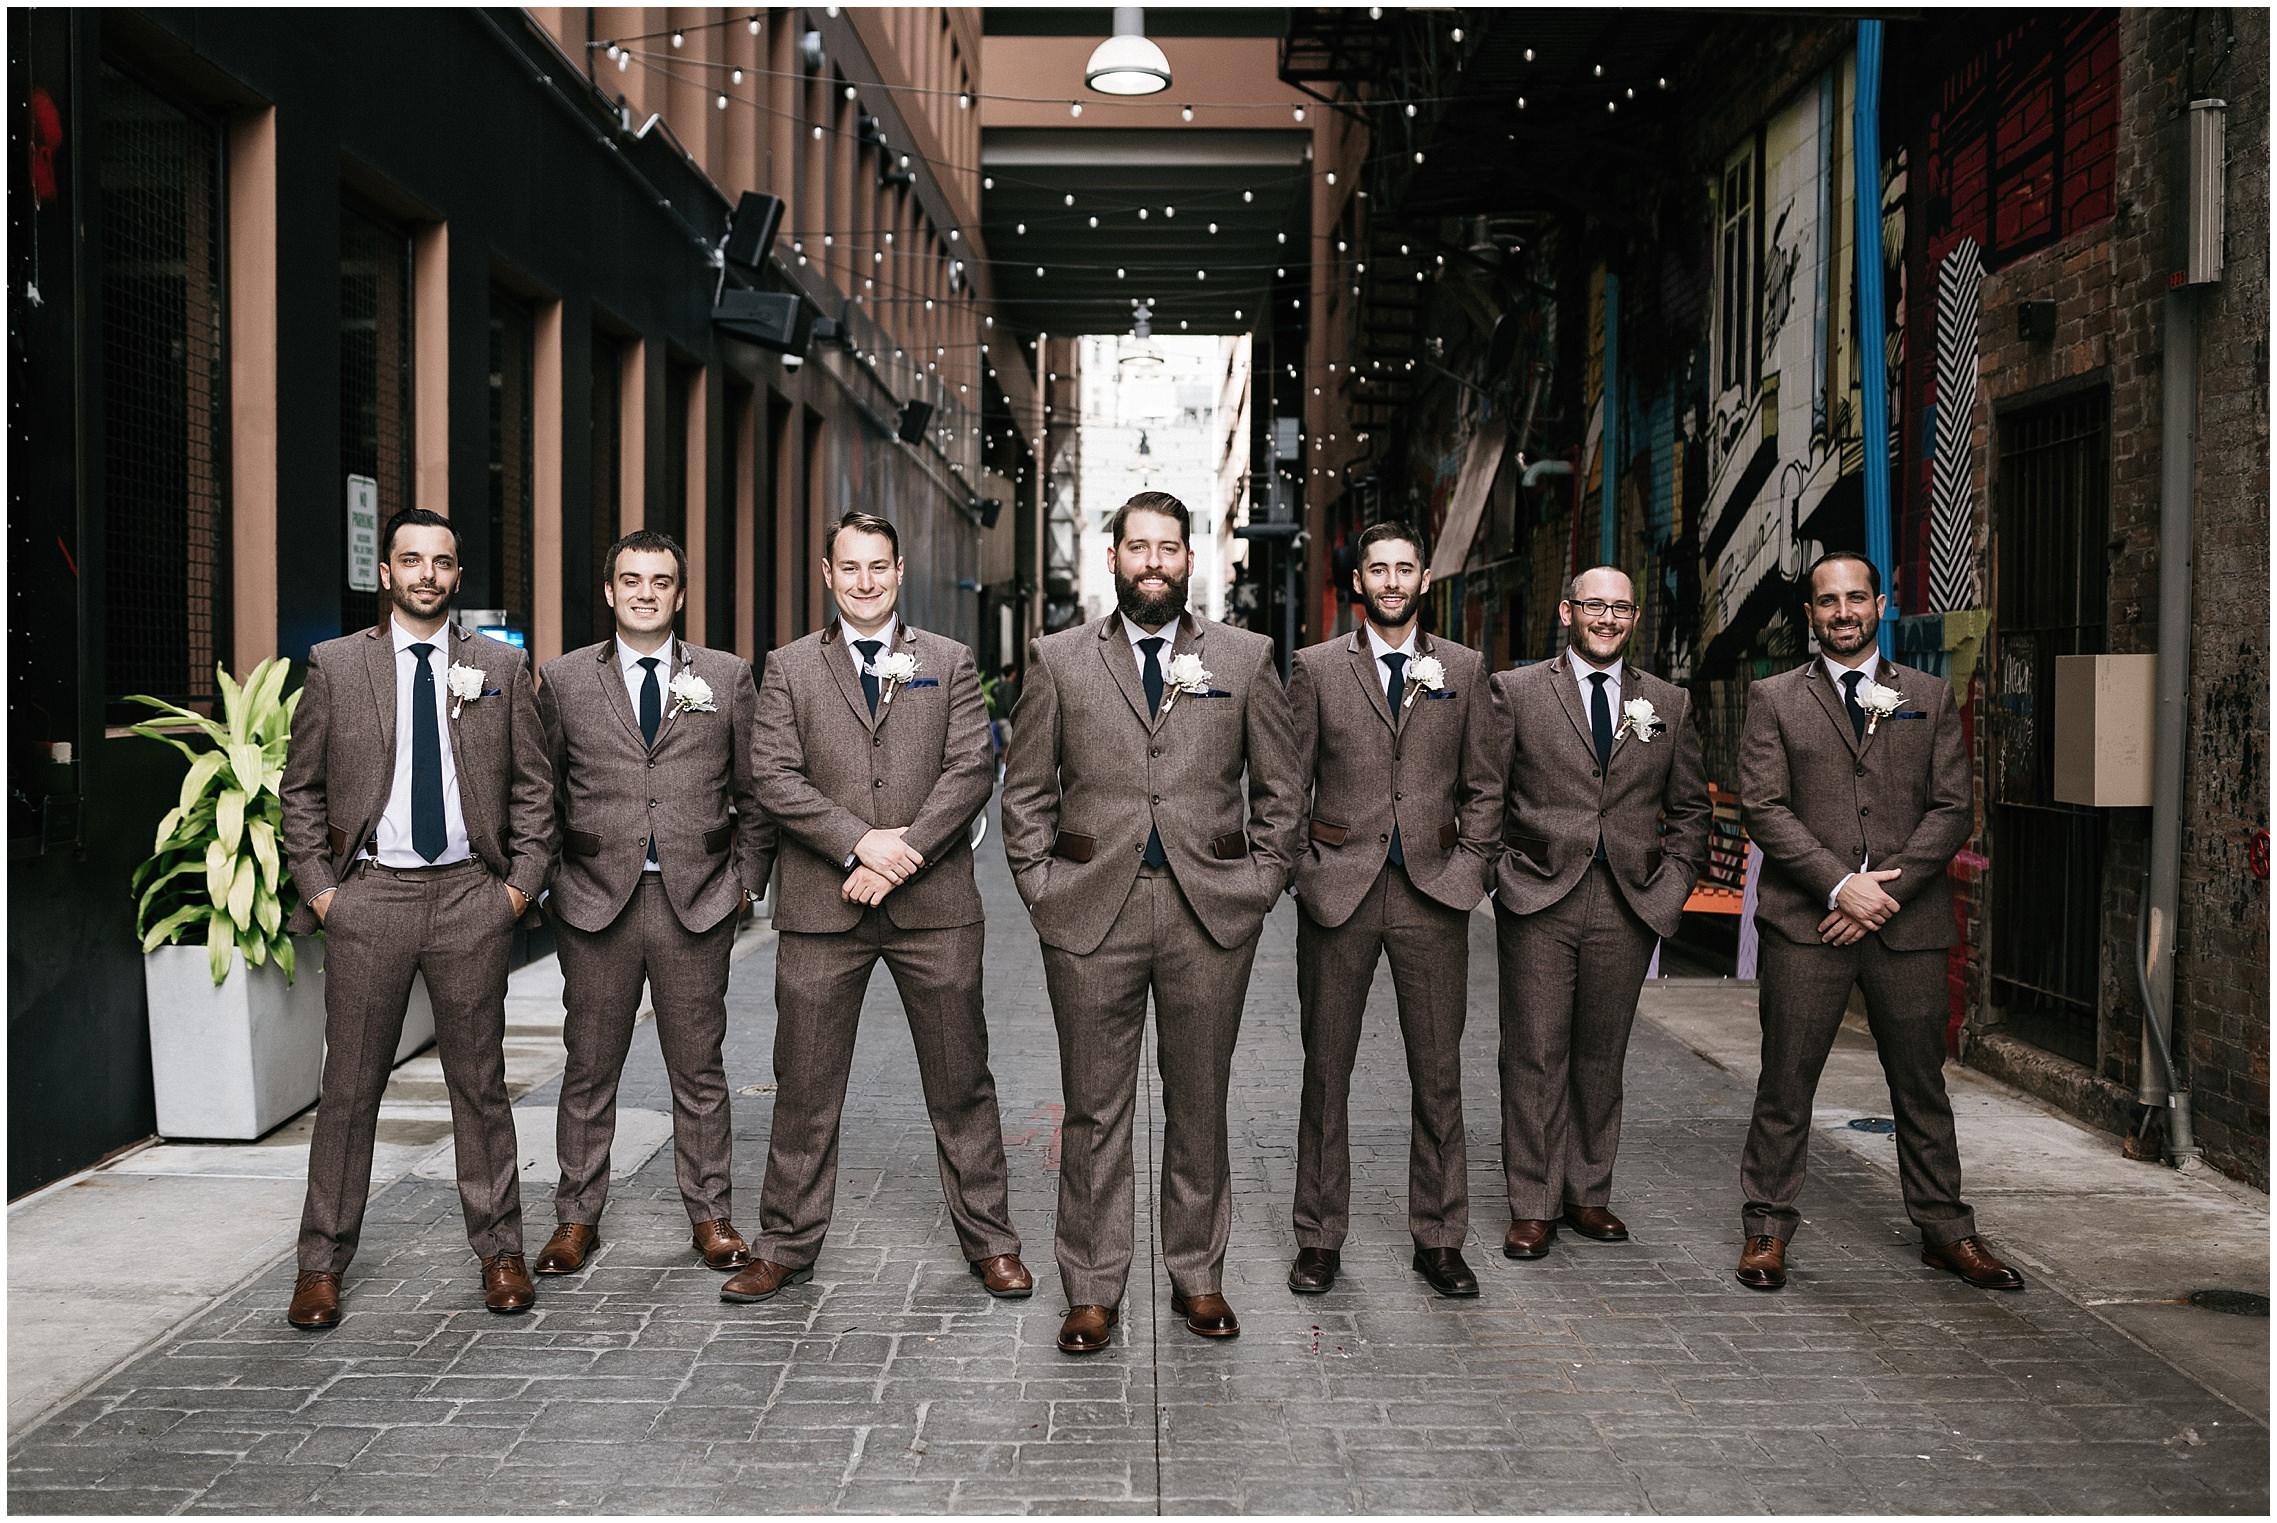 brick_and_mortar_colorado_wedding_photographer_0218.jpg